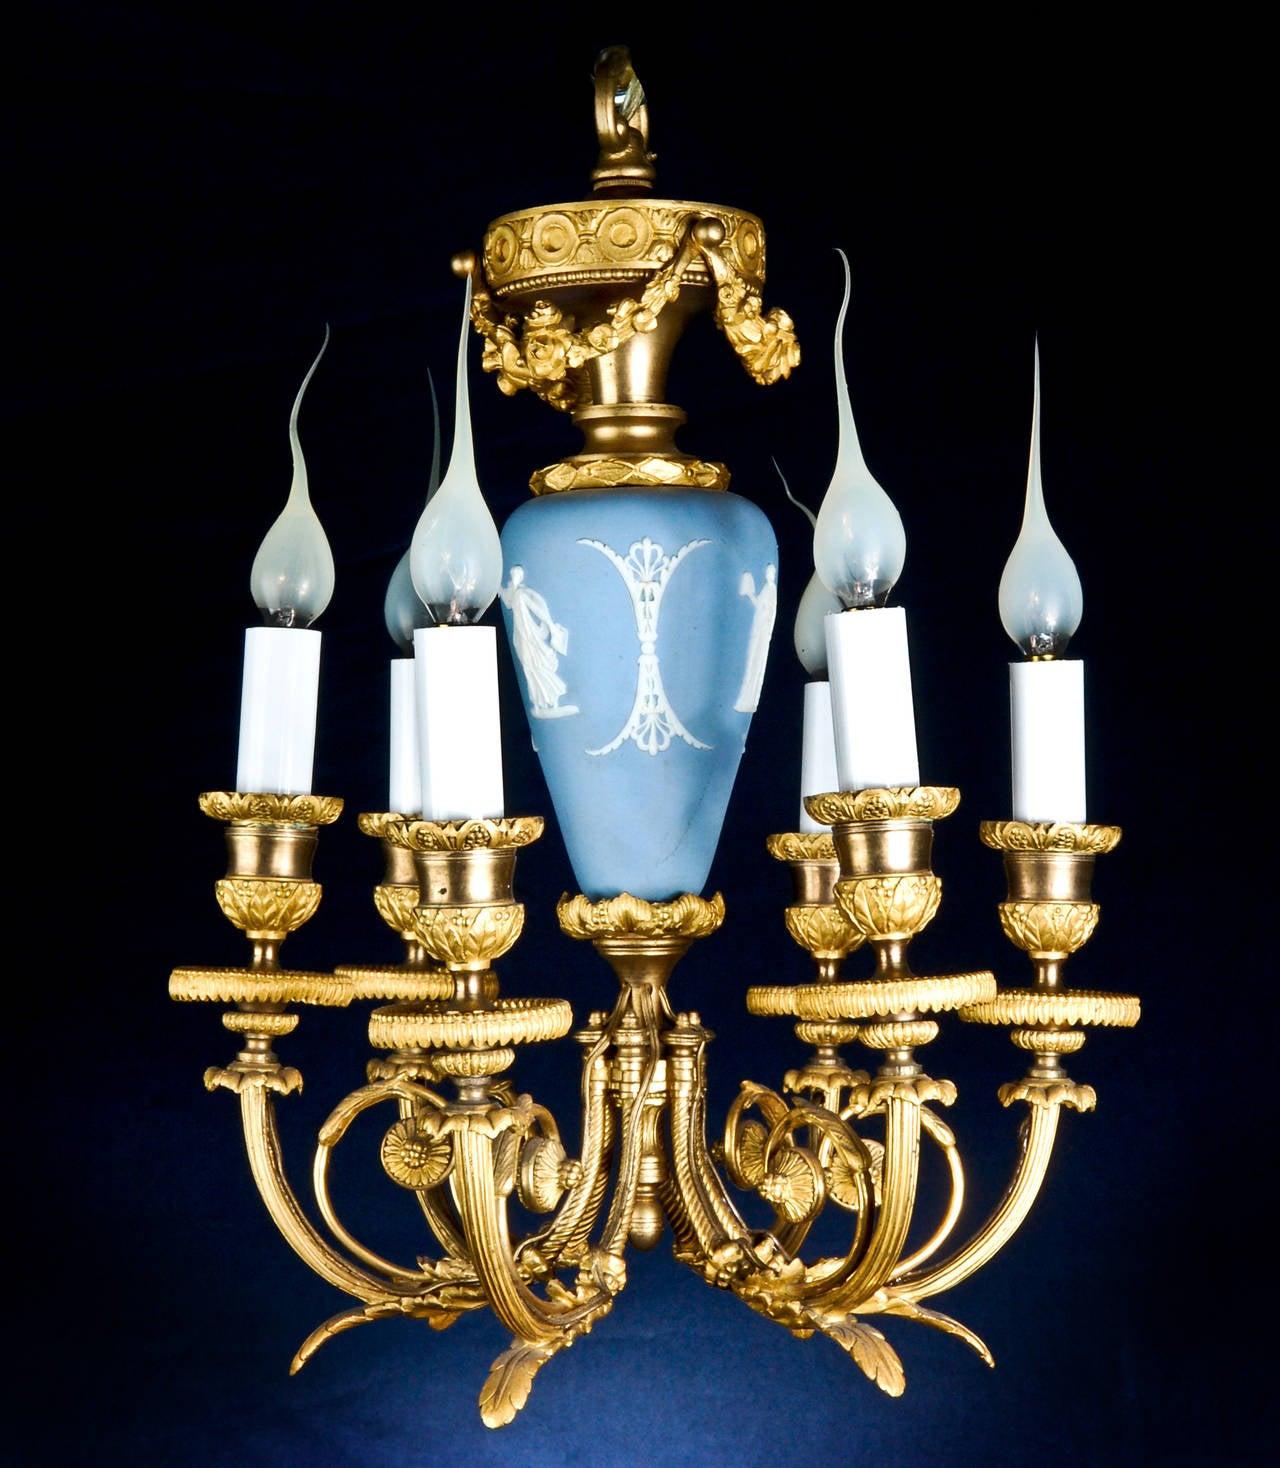 A Fine Antique French Louis Xvi Style Gilt Bronze Blue Wedgewood Jasper Ware Porcelain Chandelier